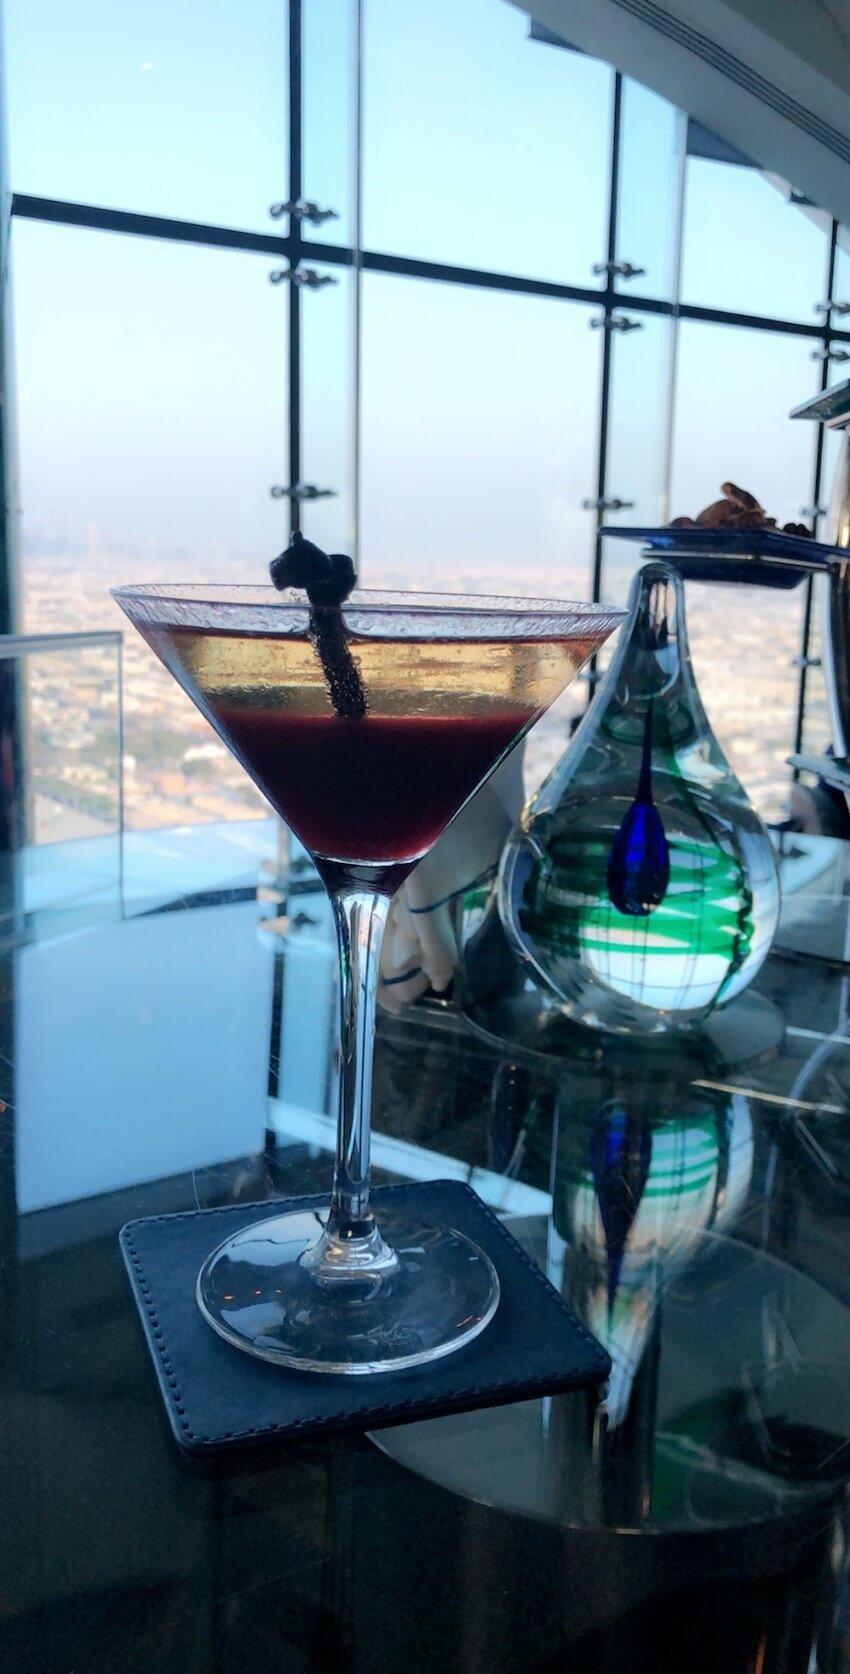 5-stjernes hotell, Burj al-arab